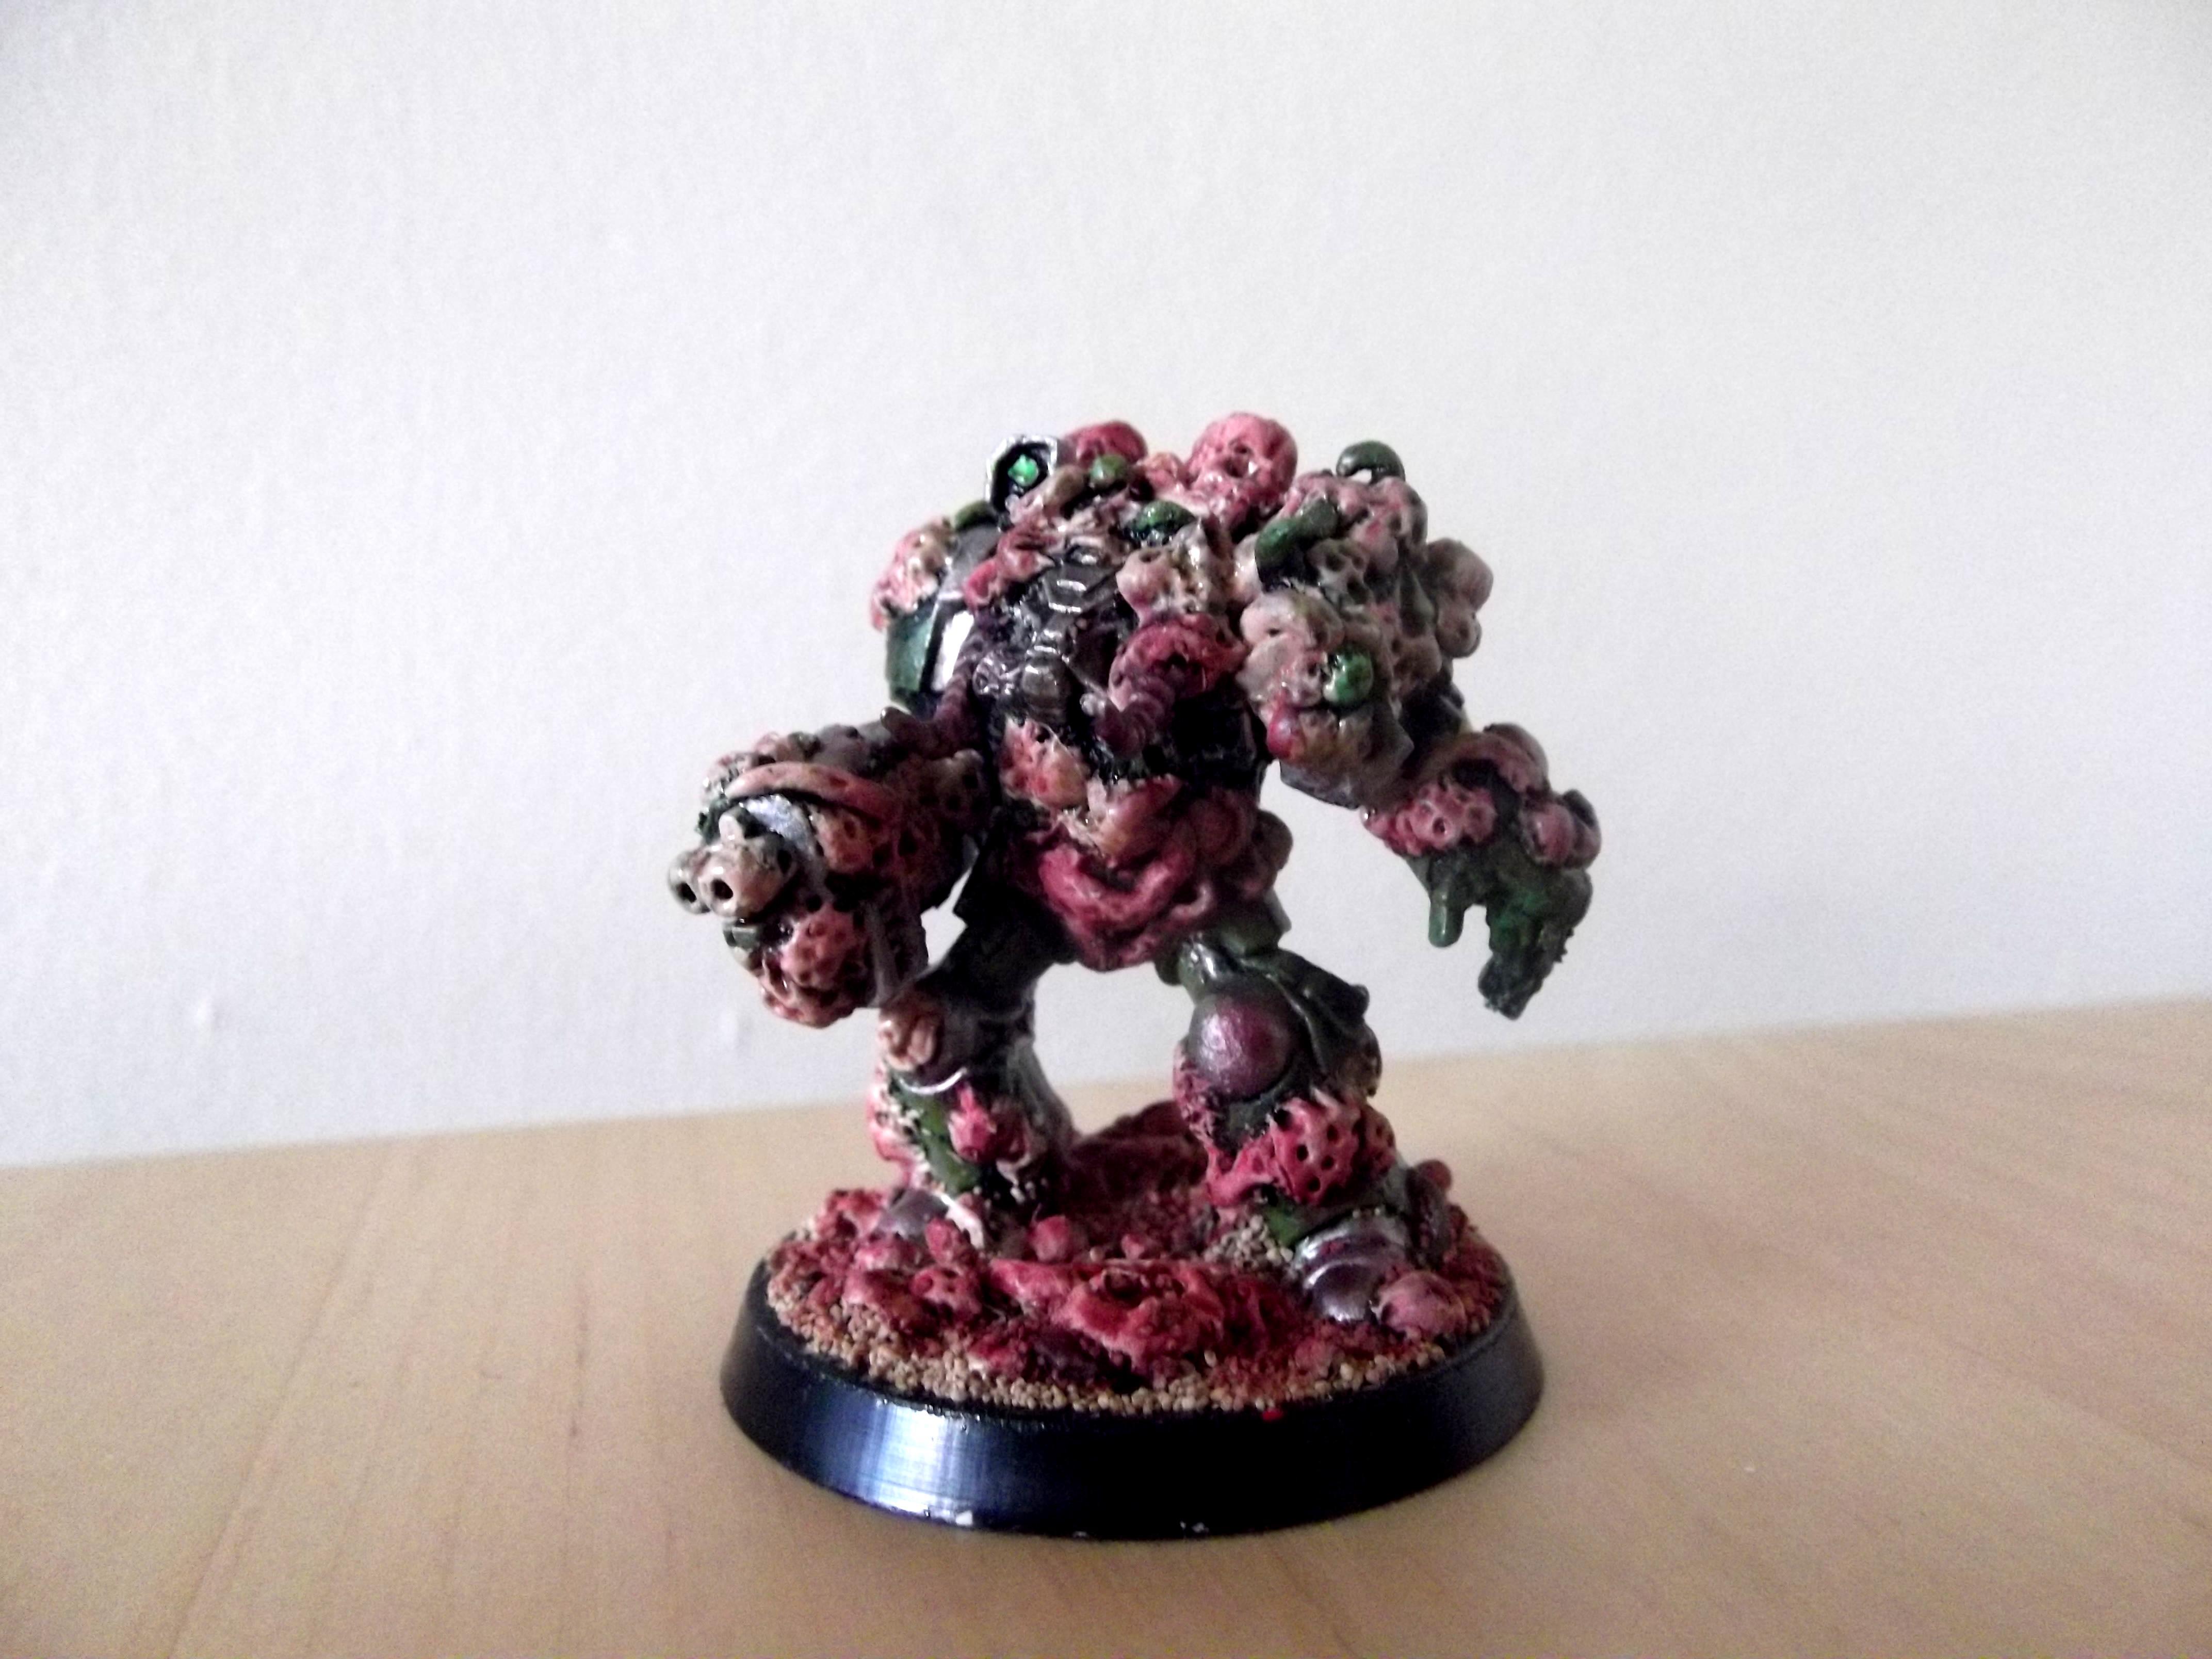 Chaos, Conversion, Daemons, Nurgle, Power Fist, Terminator Armor, Warhammer 40,000, Warhammer Fantasy